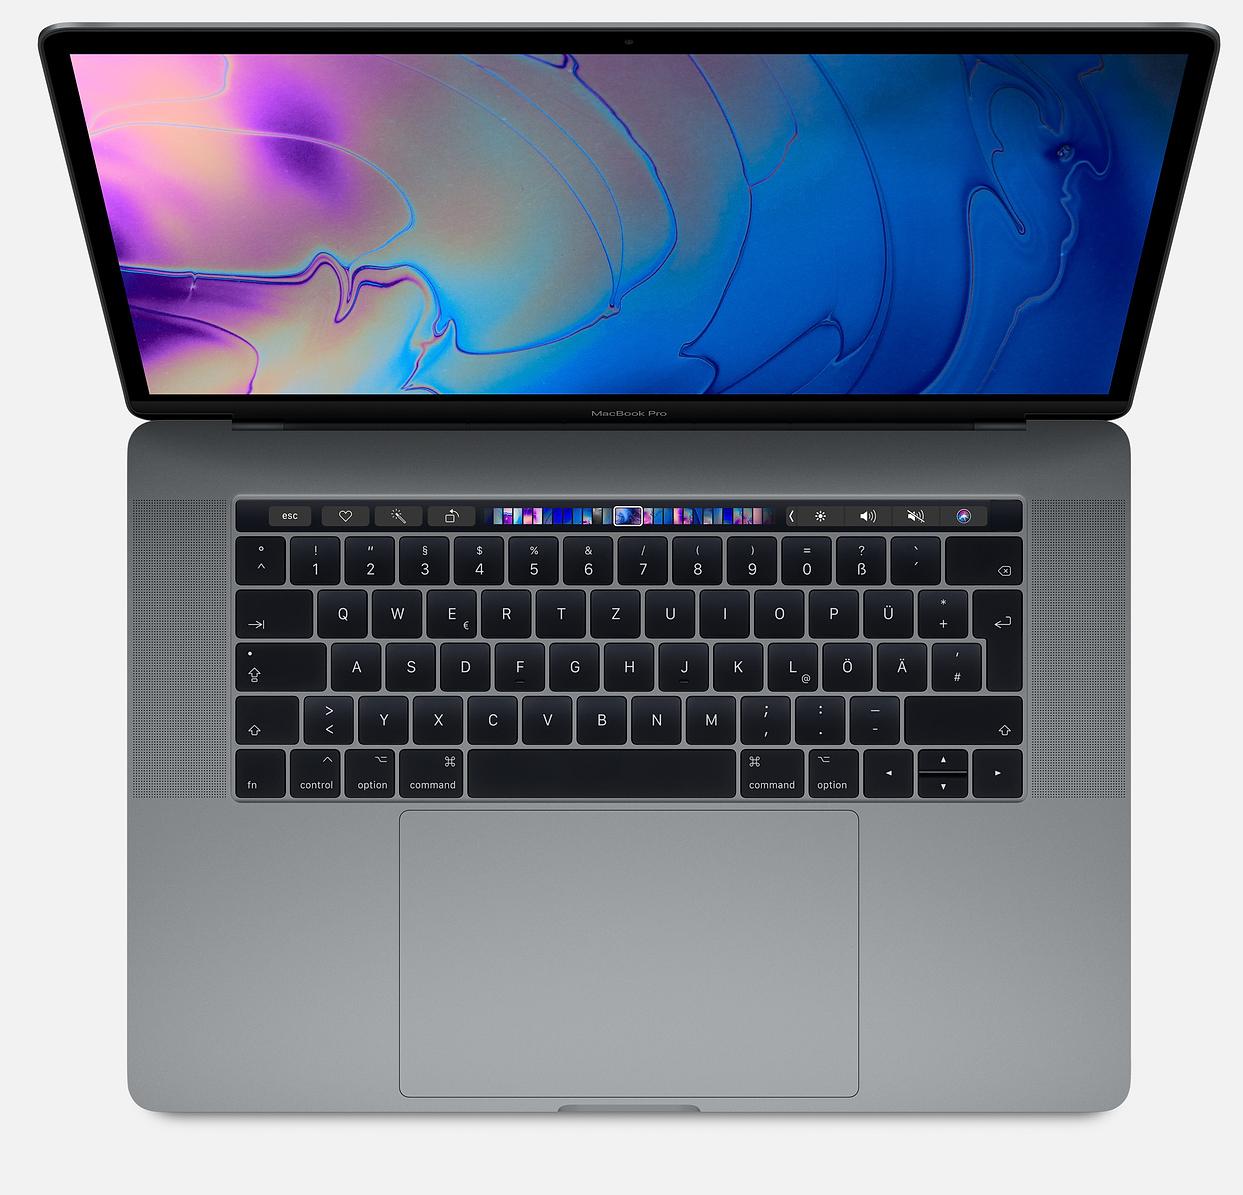 15,4  MacBook Pro 2,9 GHz Intel 6-Core i9 32GB RAM • 1 TB SSD • RP 560X.